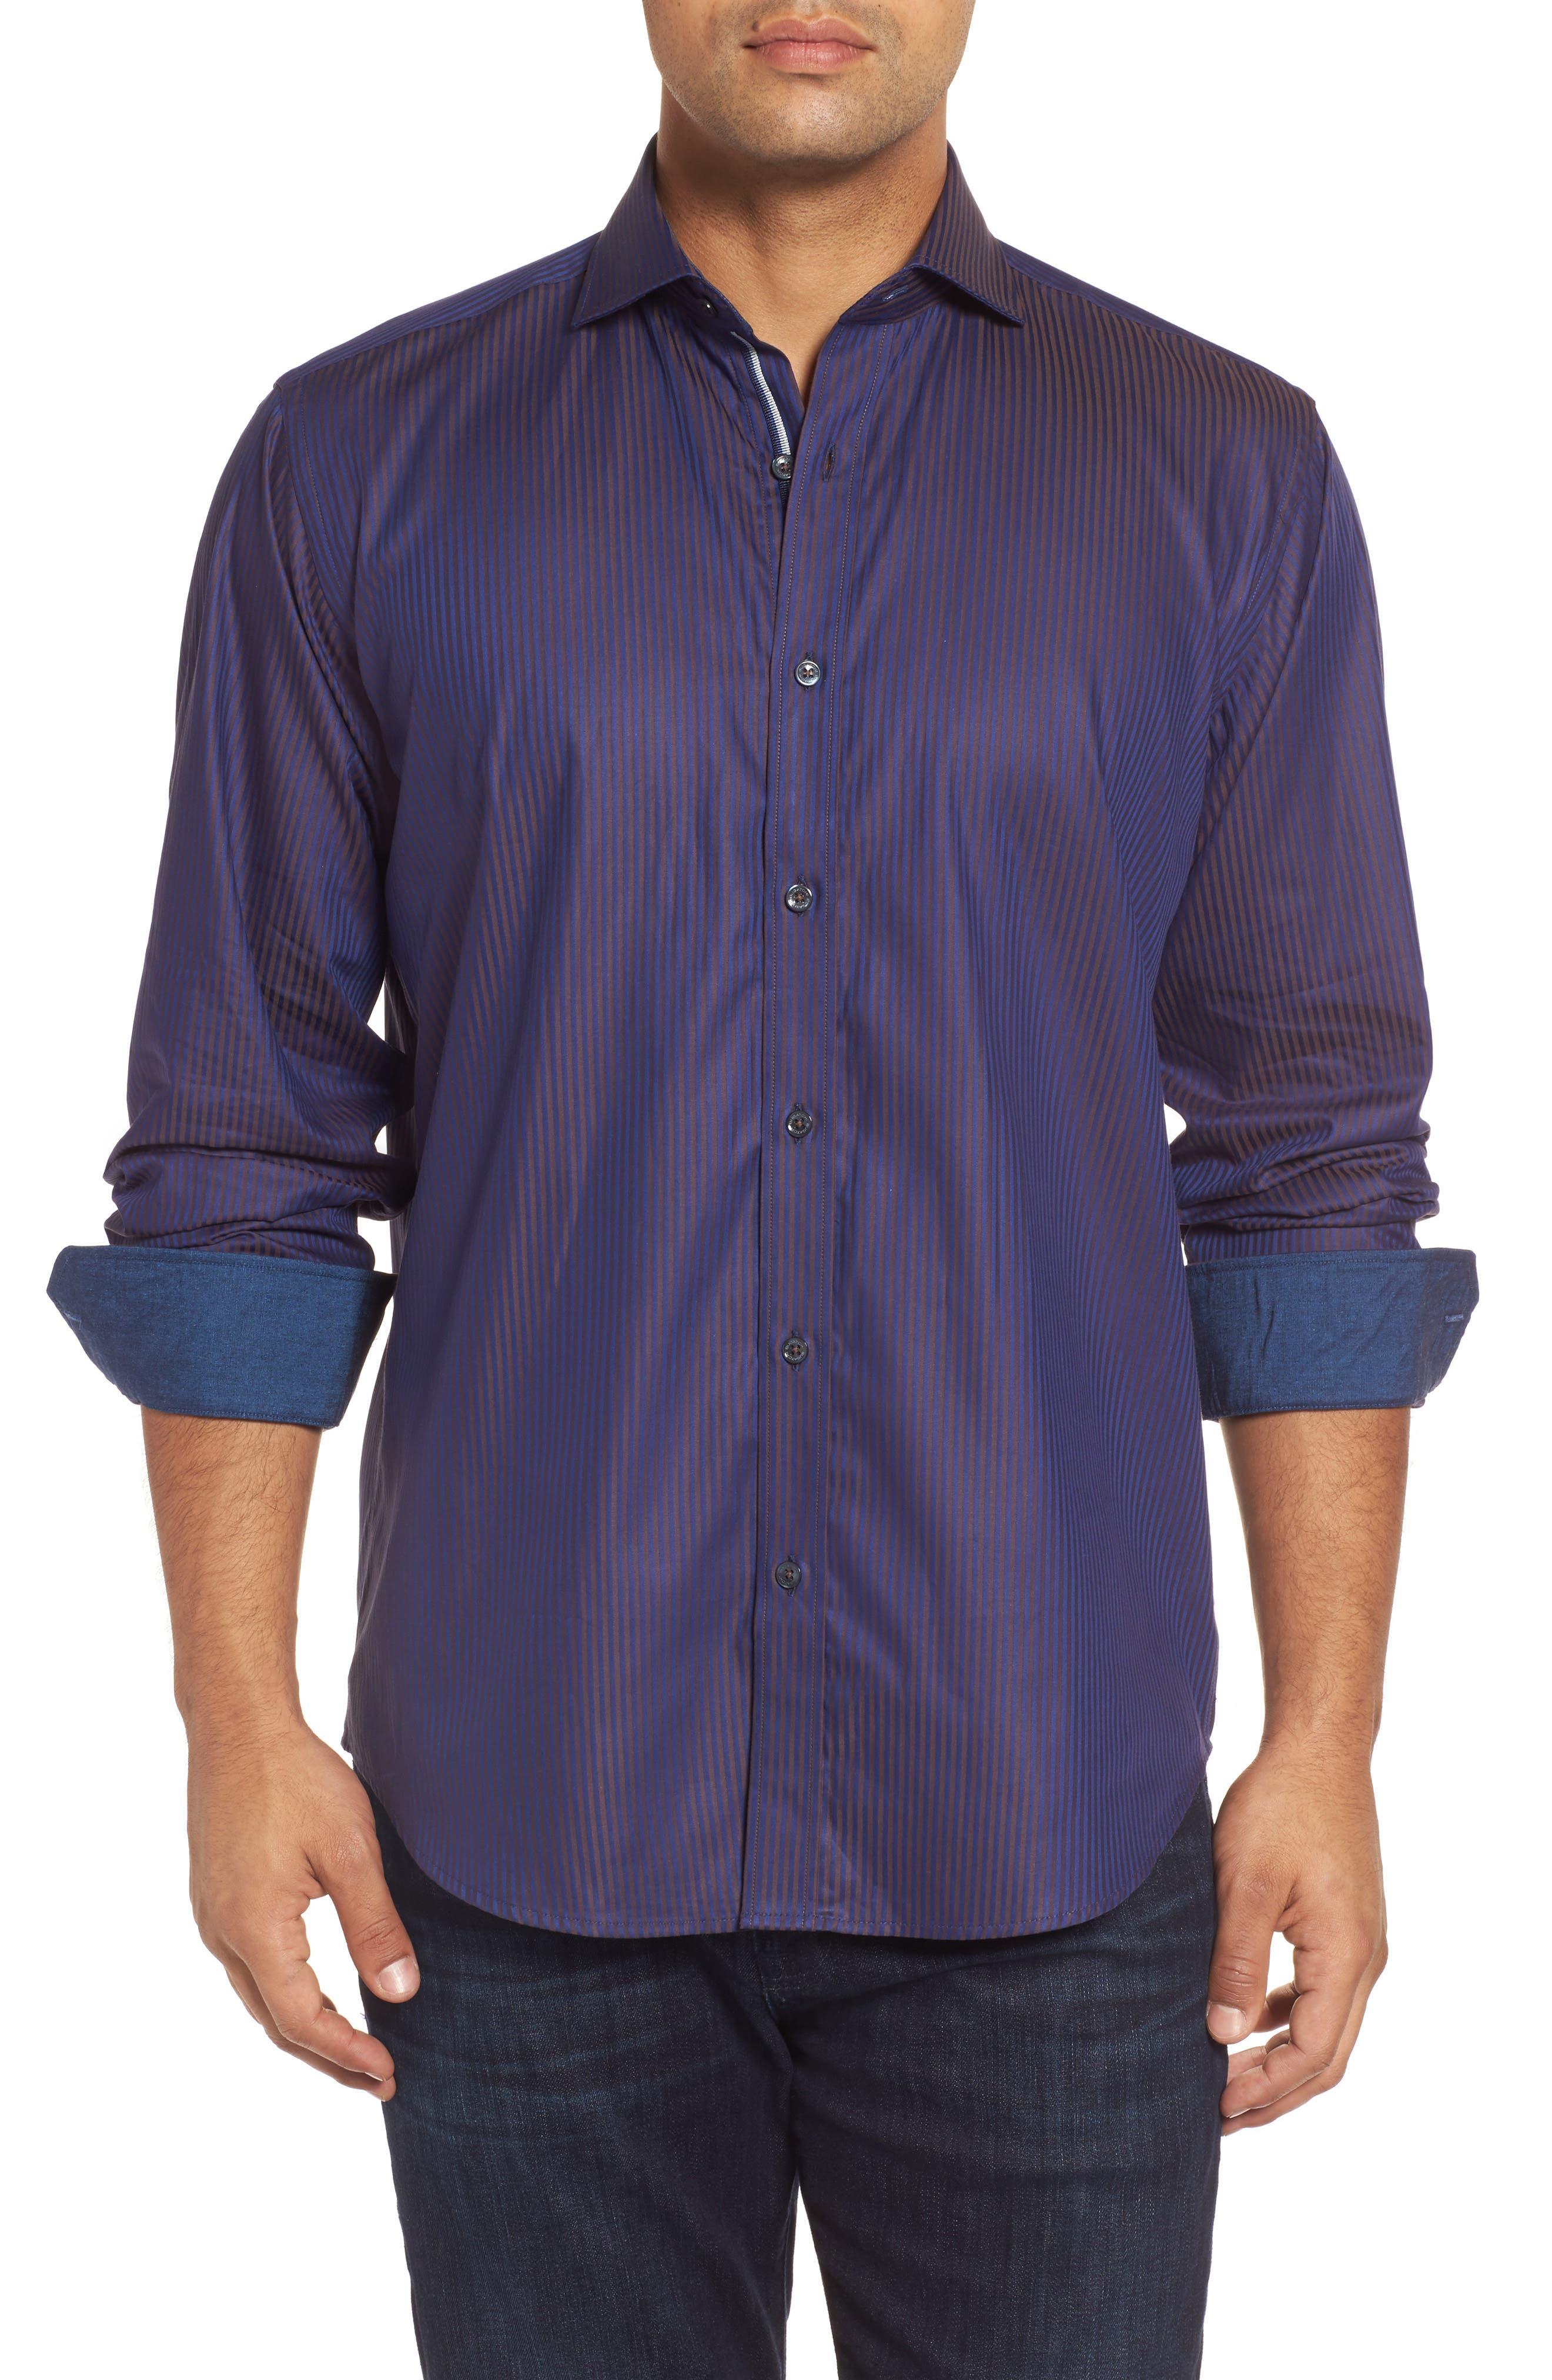 Alternate Image 1 Selected - Bugatchi Classic Fit Herringbone Pinstripe Sport Shirt